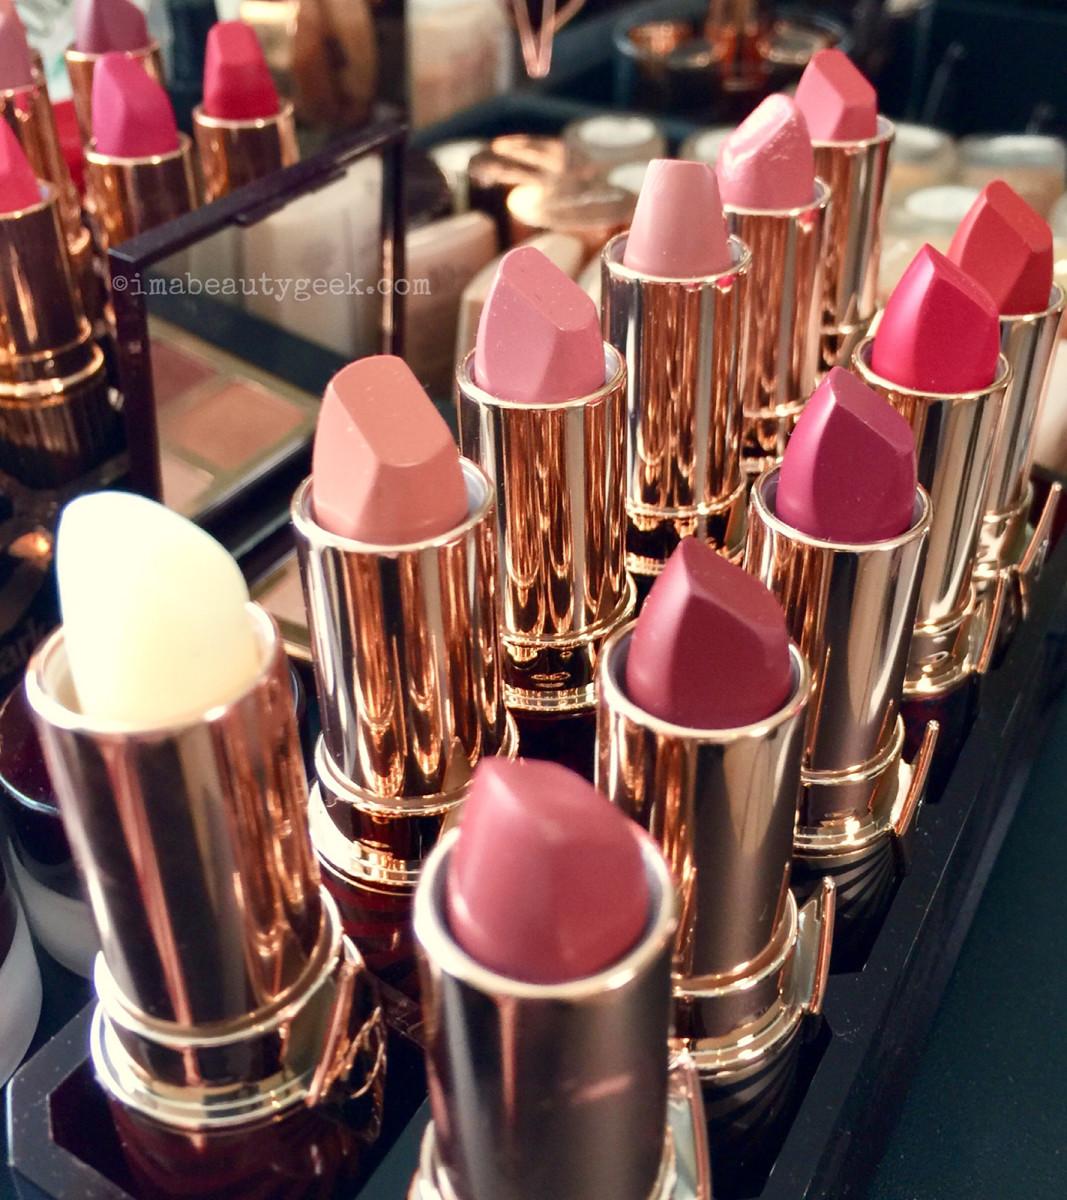 Charlotte Tilbury Hot Lips 2 all eleven shades